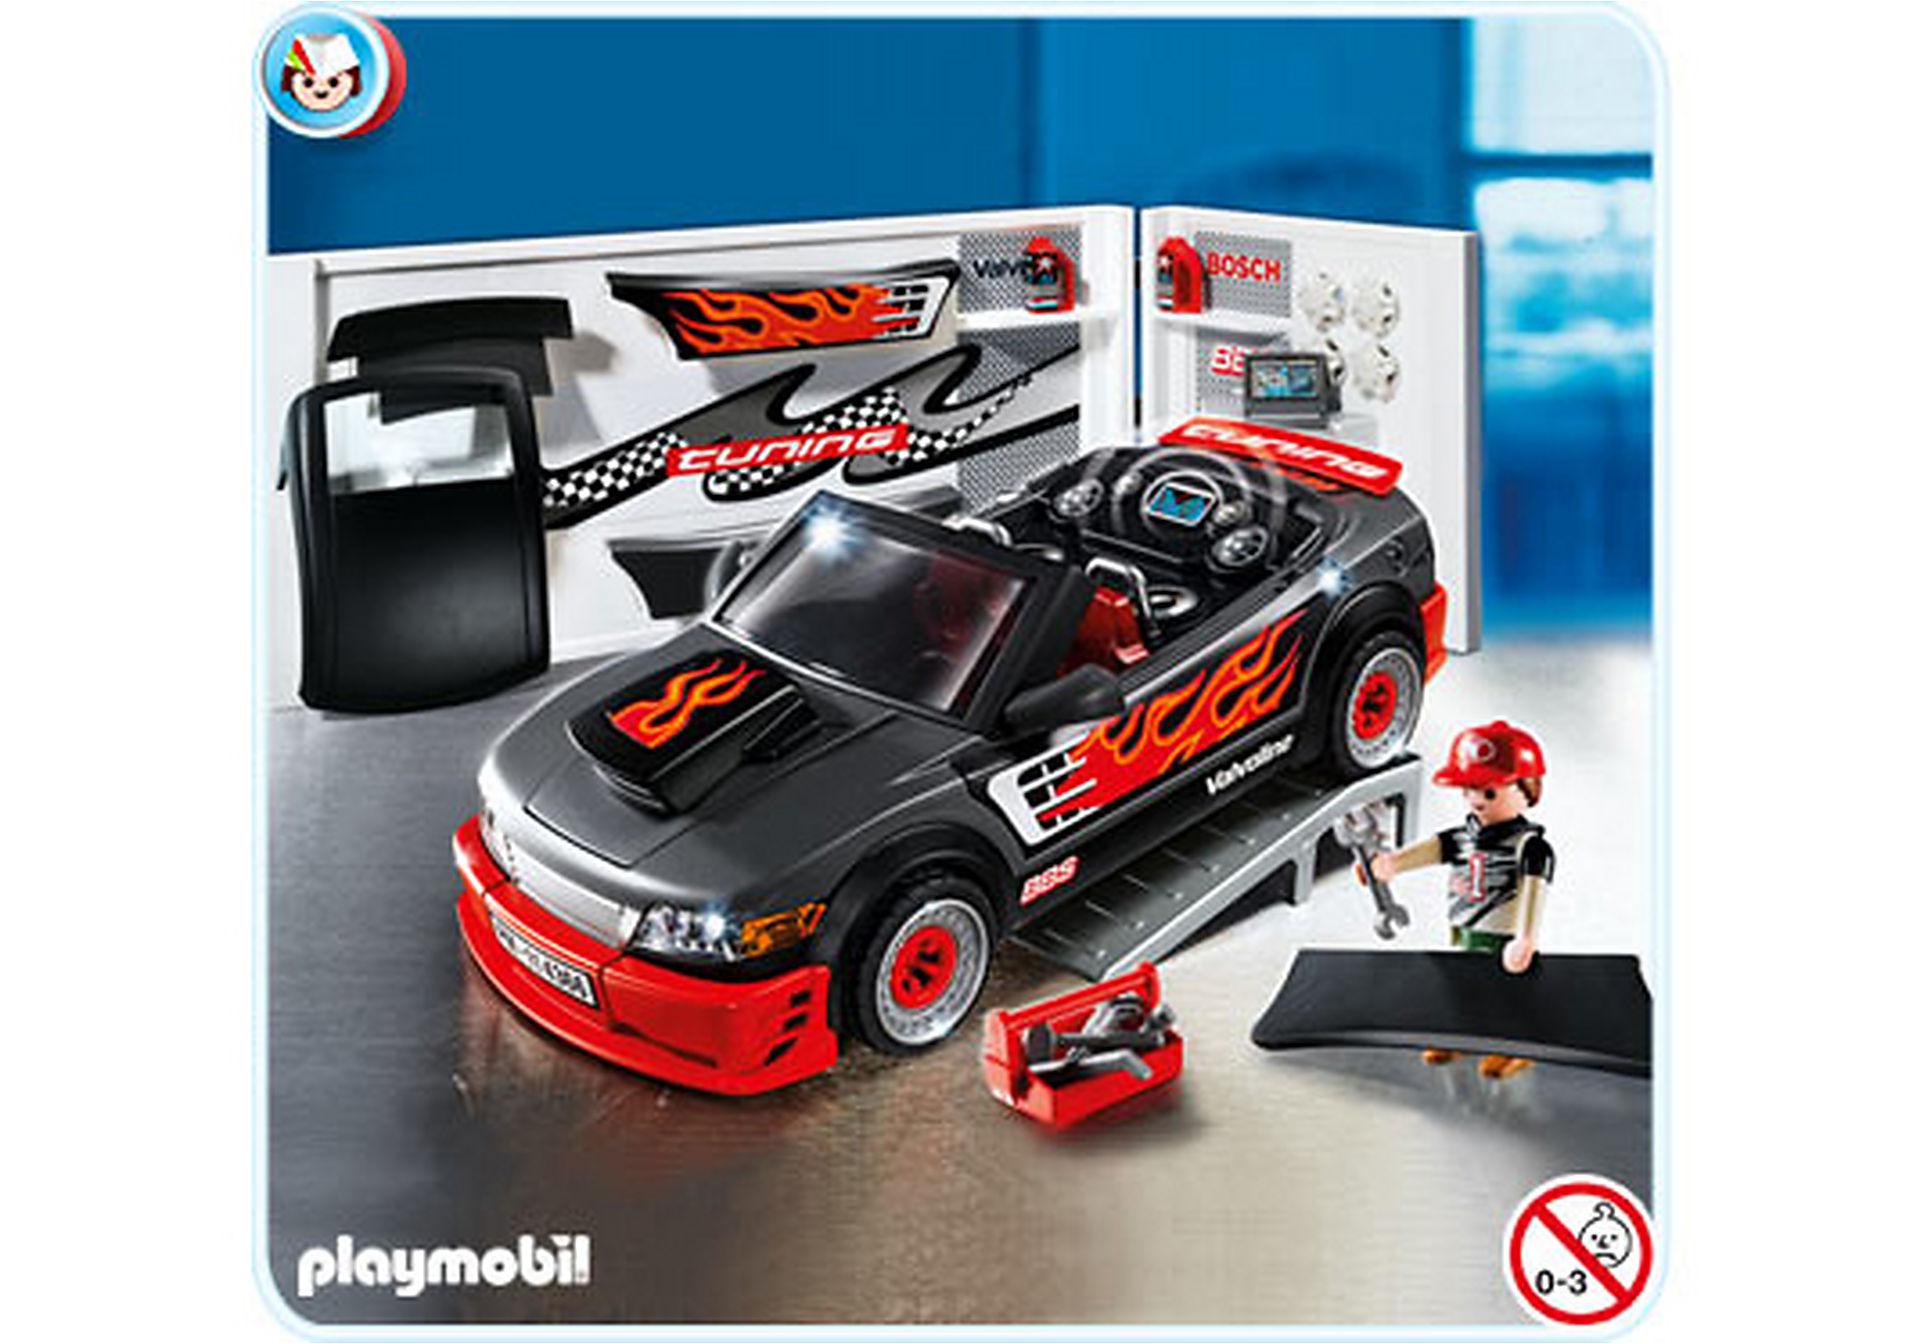 http://media.playmobil.com/i/playmobil/4366-A_product_detail/Tuning-Sportwagen mit Sound